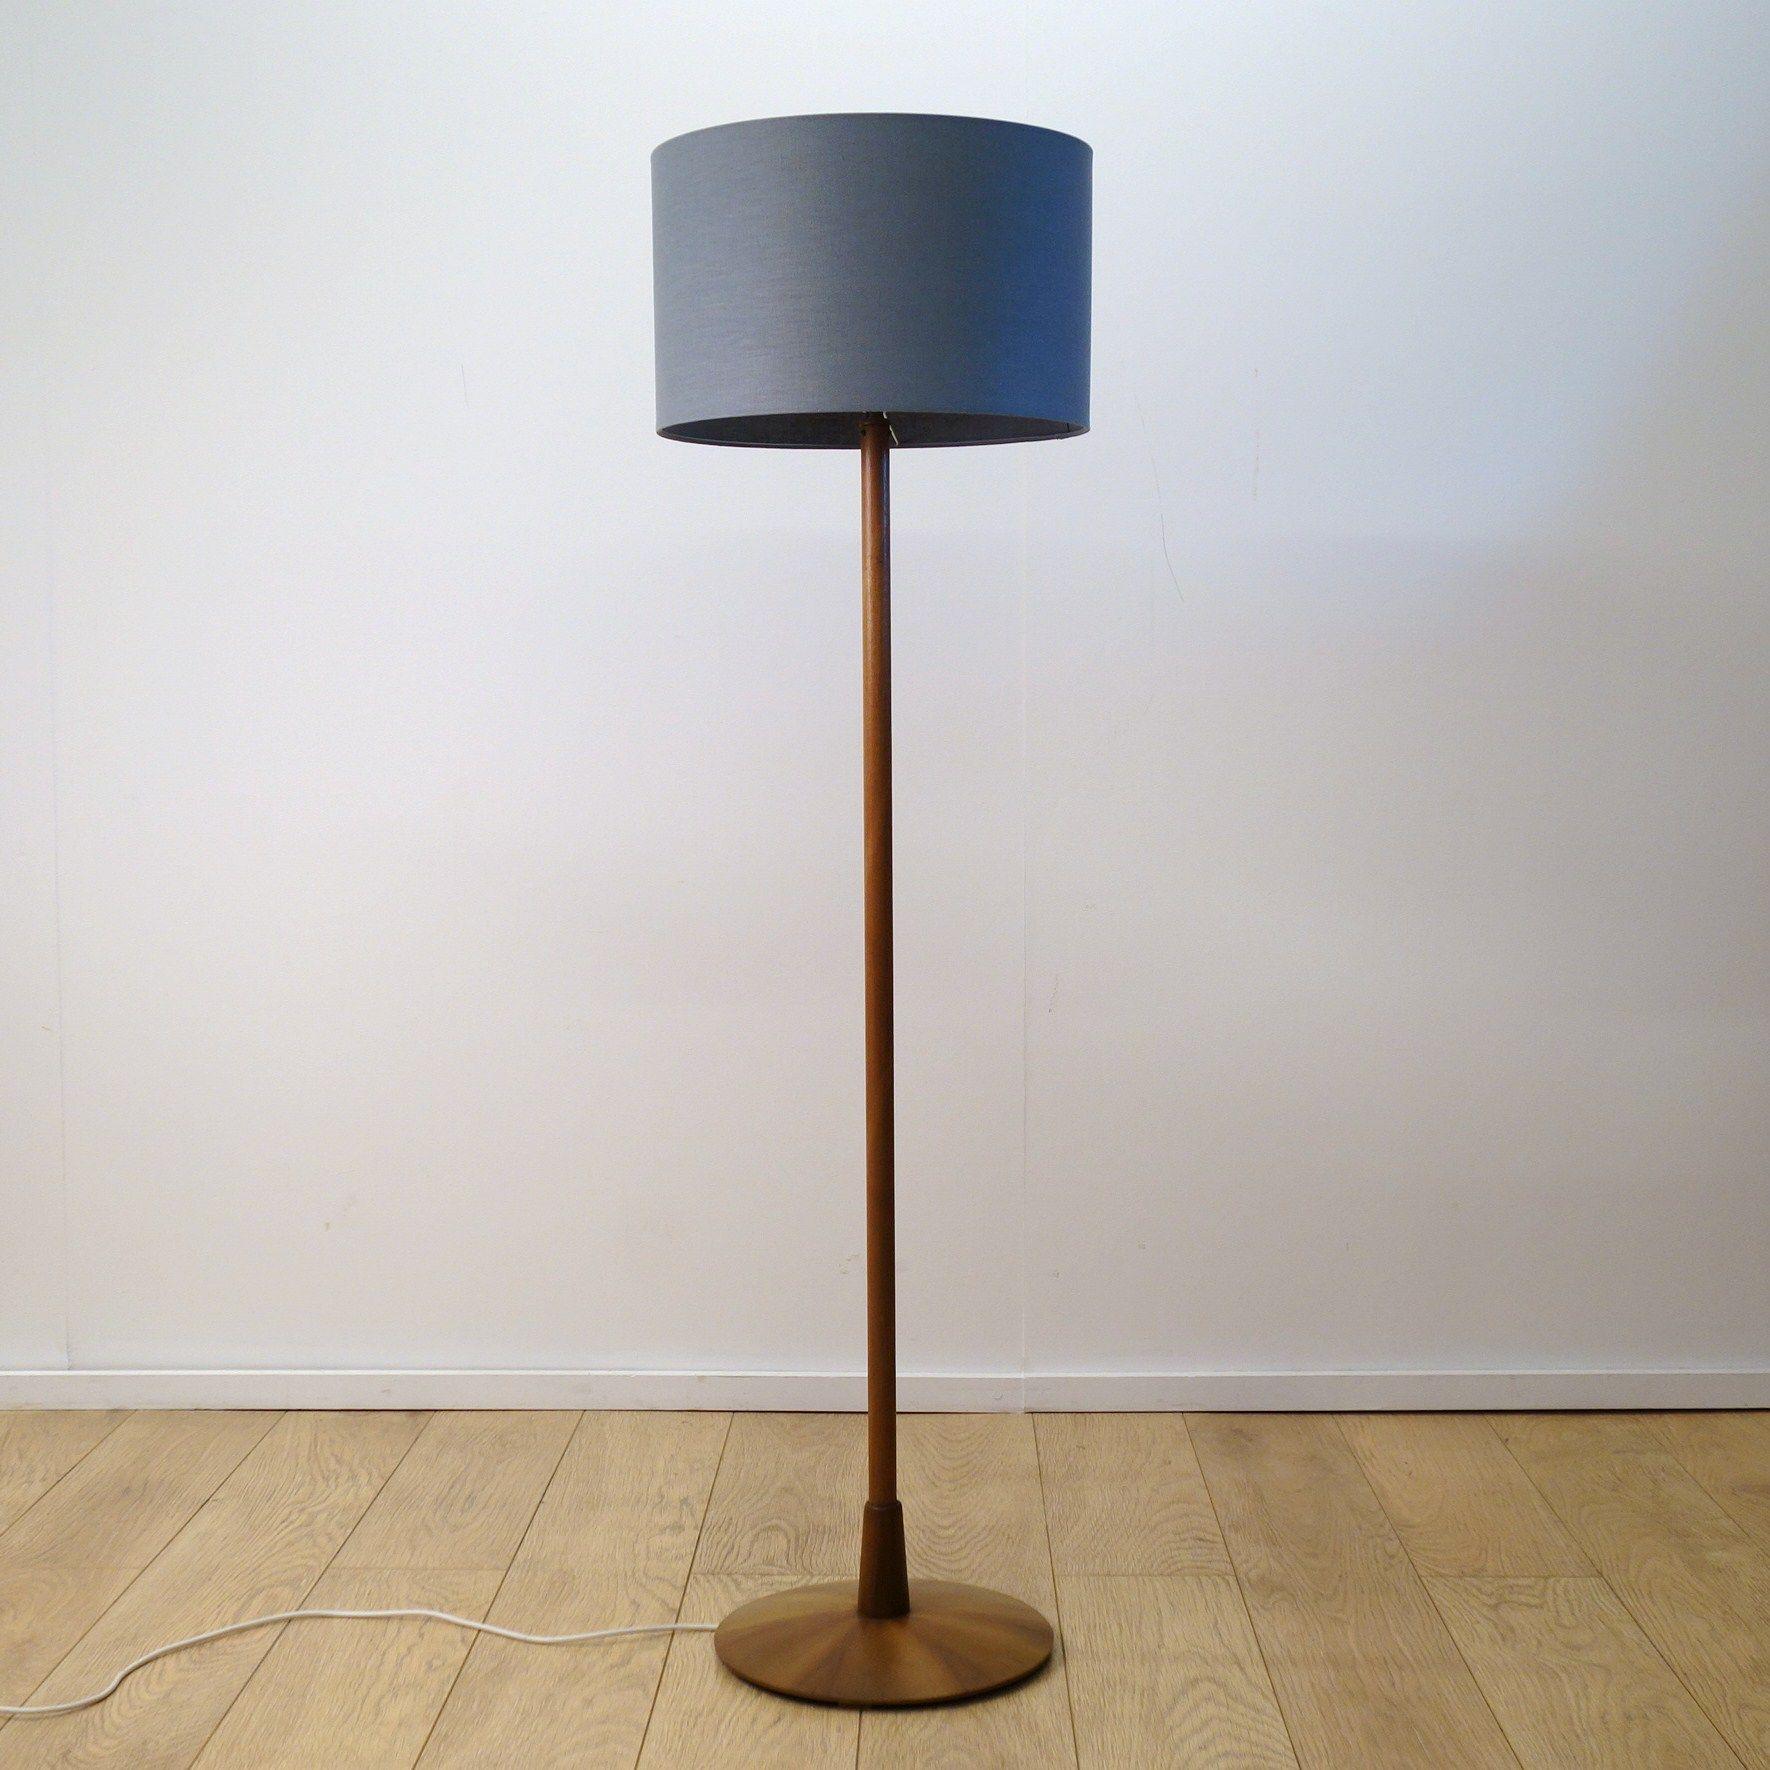 buy retro 1950s 1960s teak standard lamp from mark parrish mid century modern furniture midcentury - Mid Century Modern Furniture Of The 1950s